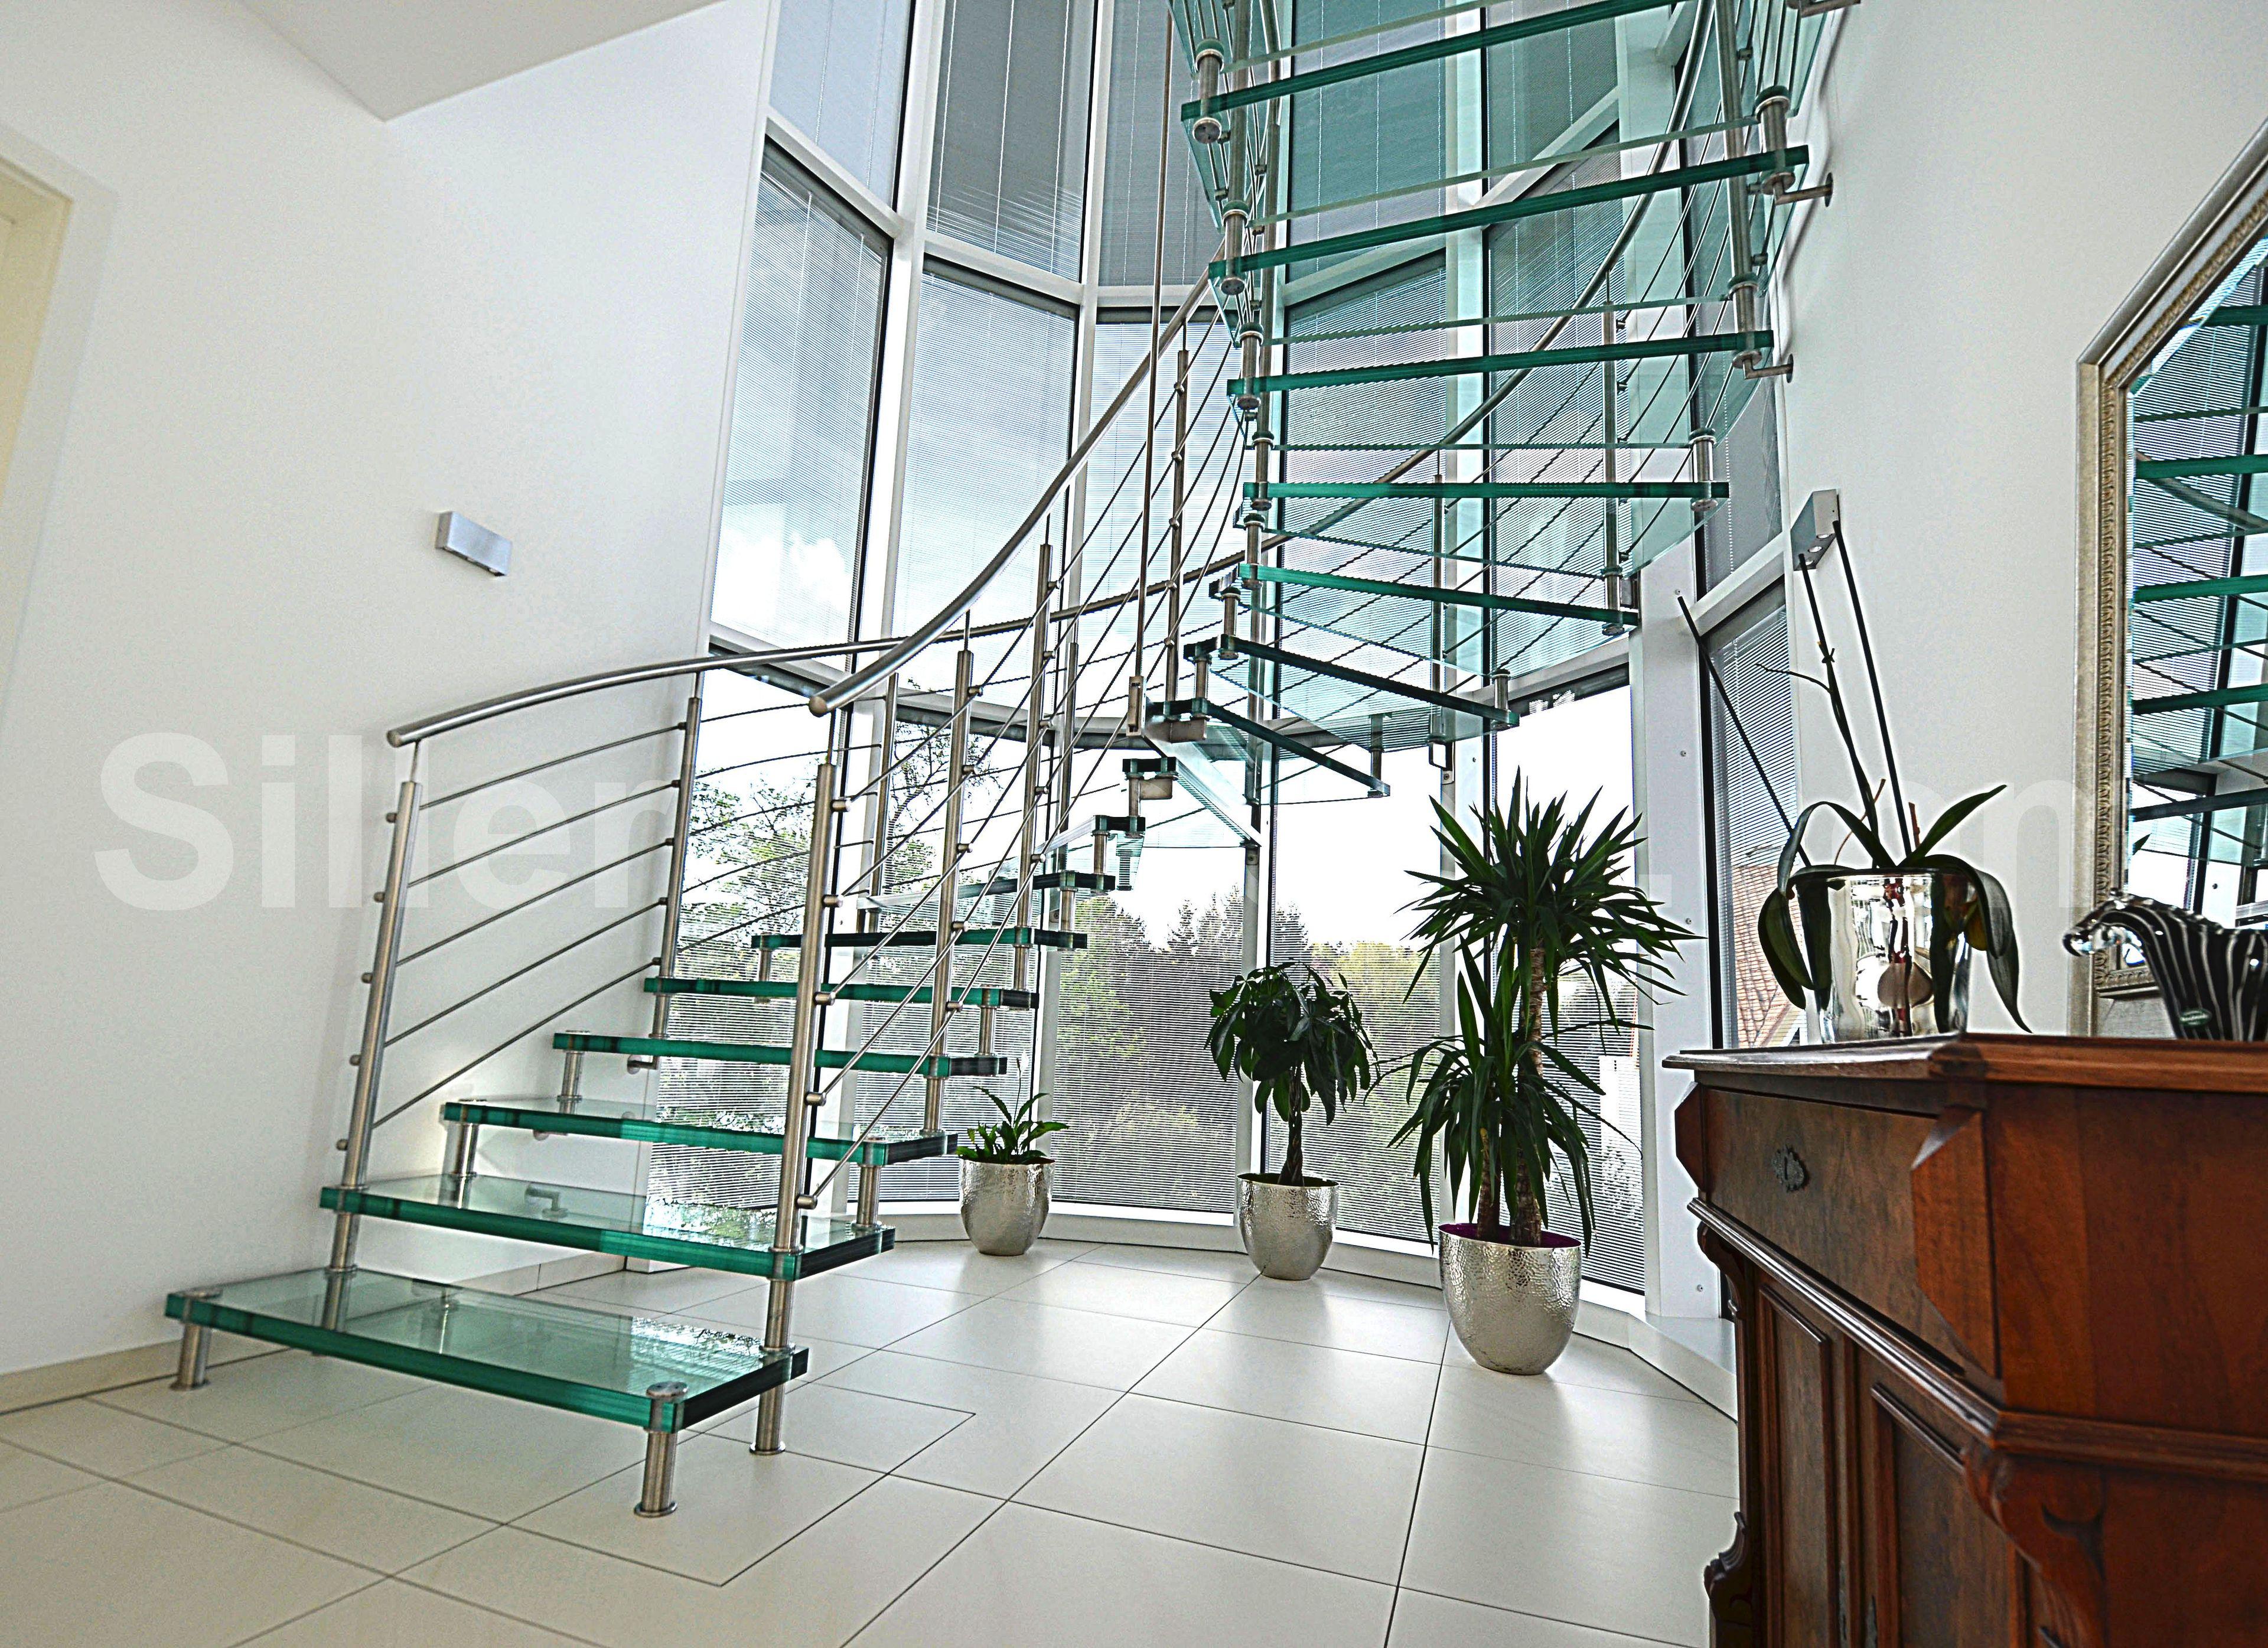 sevilla vetro open staircase by siller treppen design christian siller. Black Bedroom Furniture Sets. Home Design Ideas